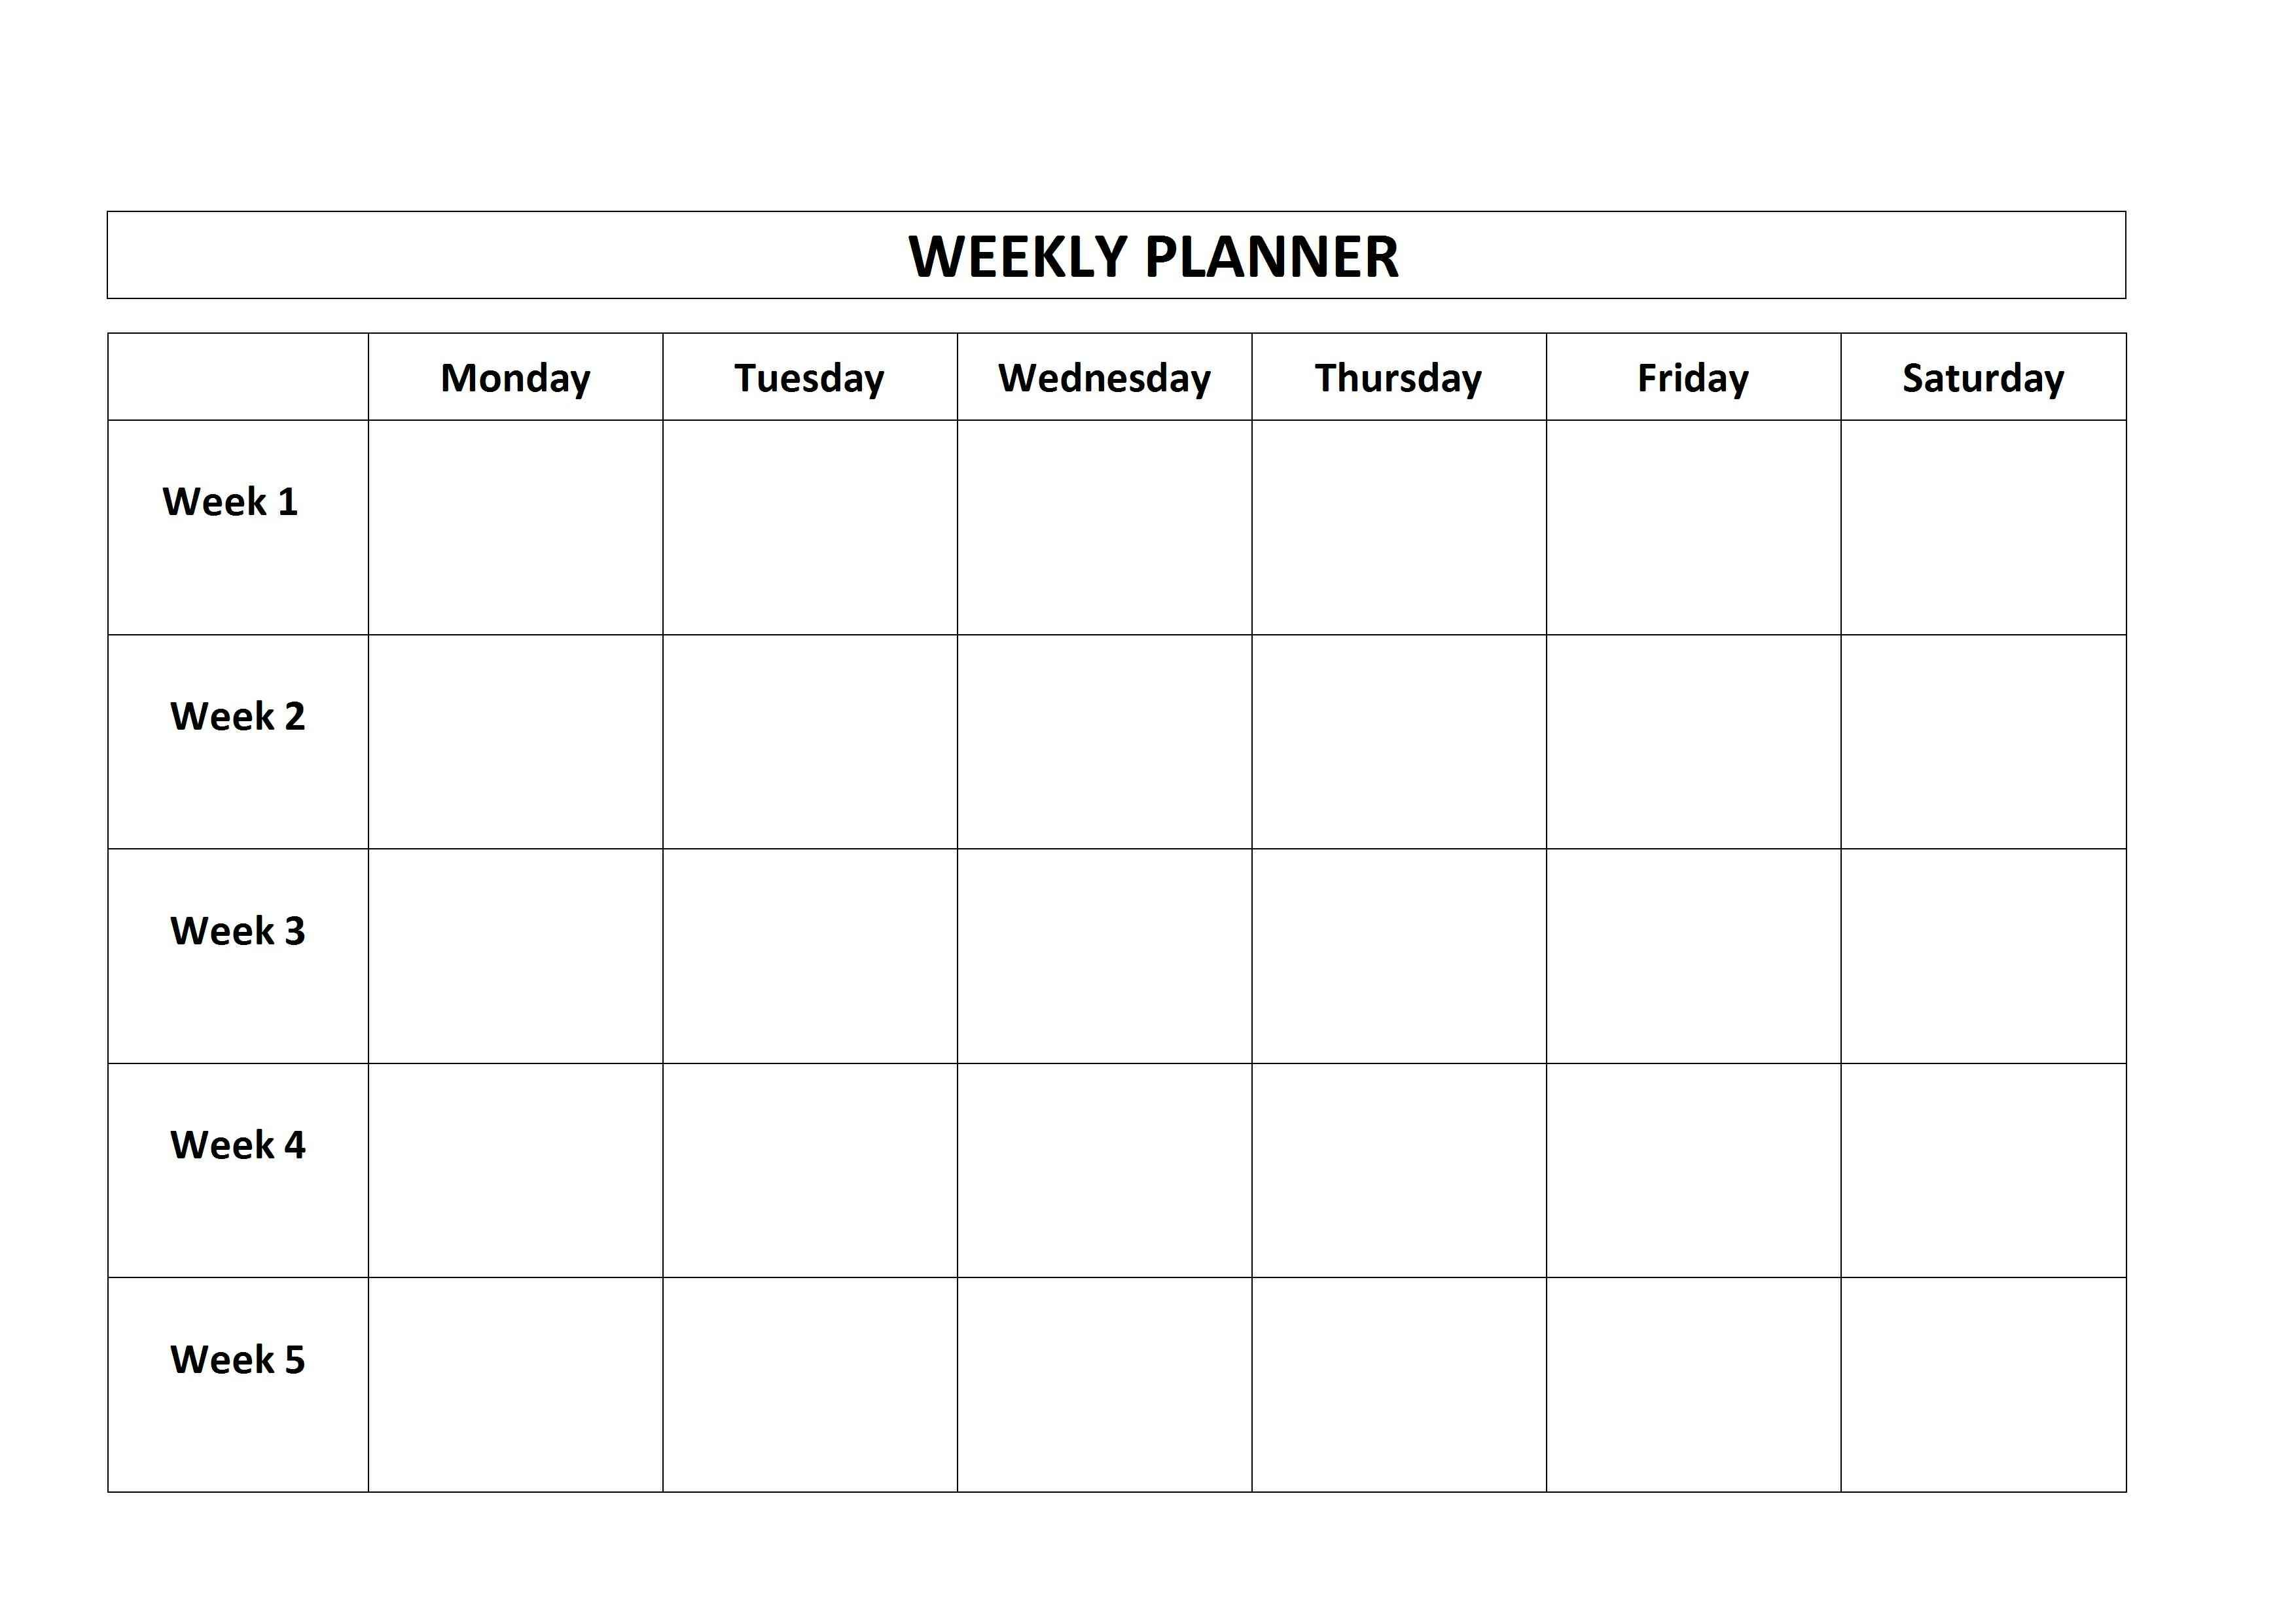 Free Printable Weekly Planner Monday Friday School Calendar On 4kl0dsbt